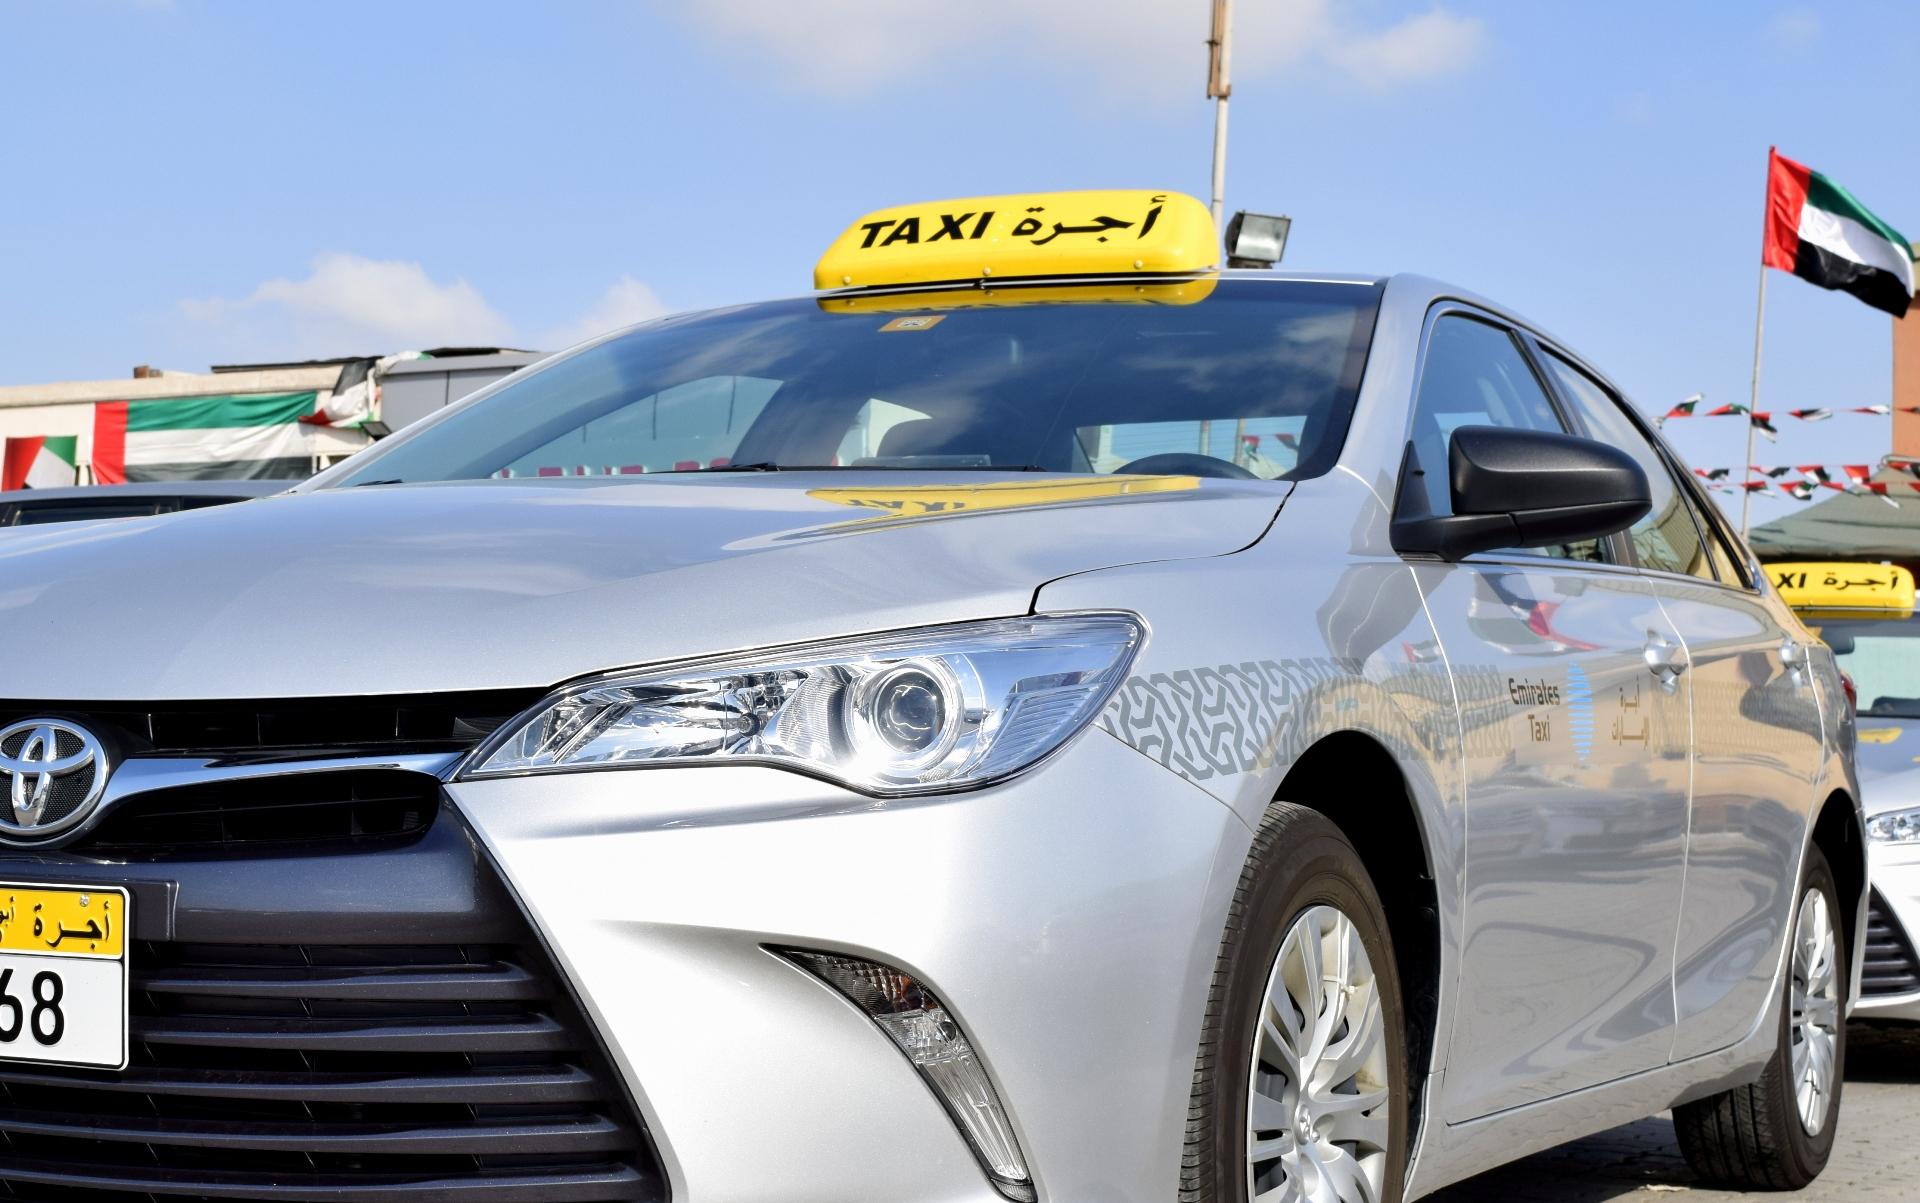 Cars Taxi Services Company